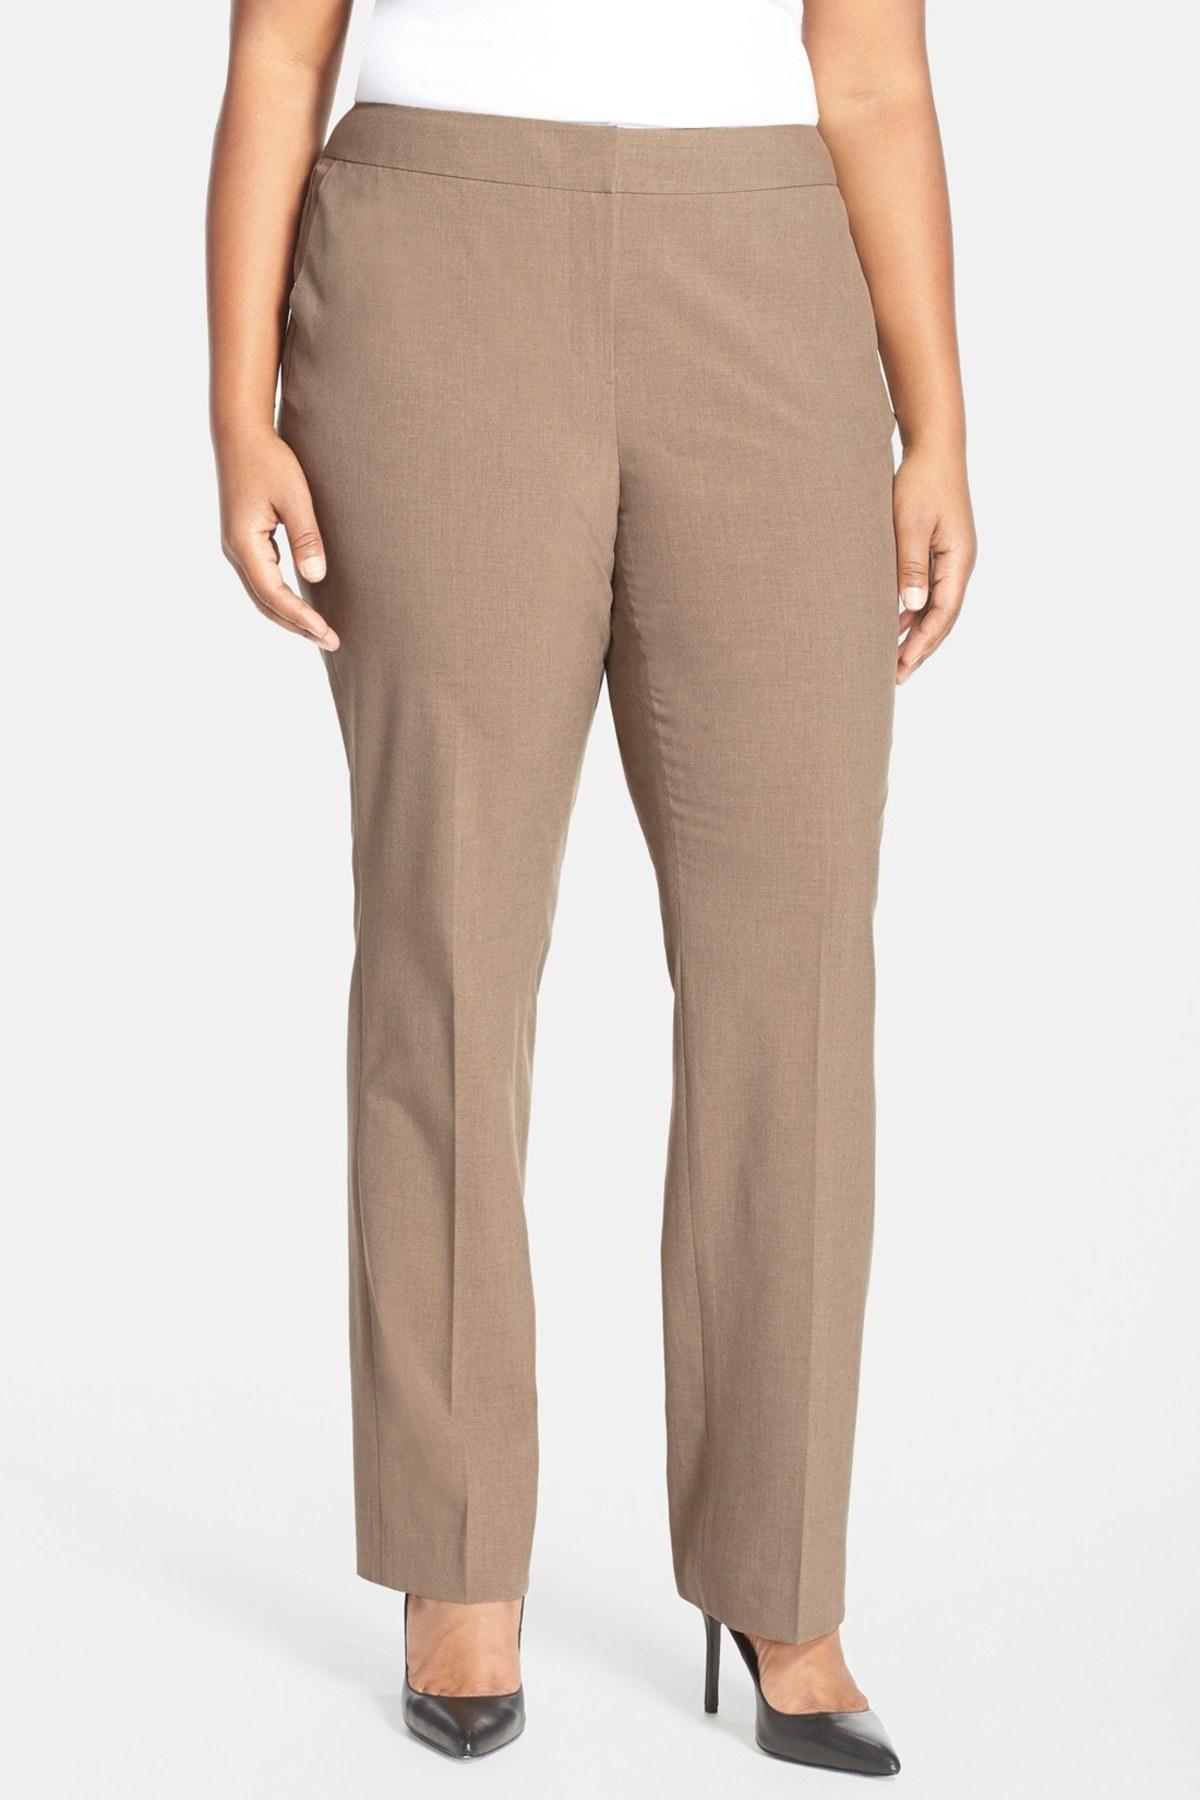 sejour 39 ela 39 modern fit trousers plus size in brown tan. Black Bedroom Furniture Sets. Home Design Ideas